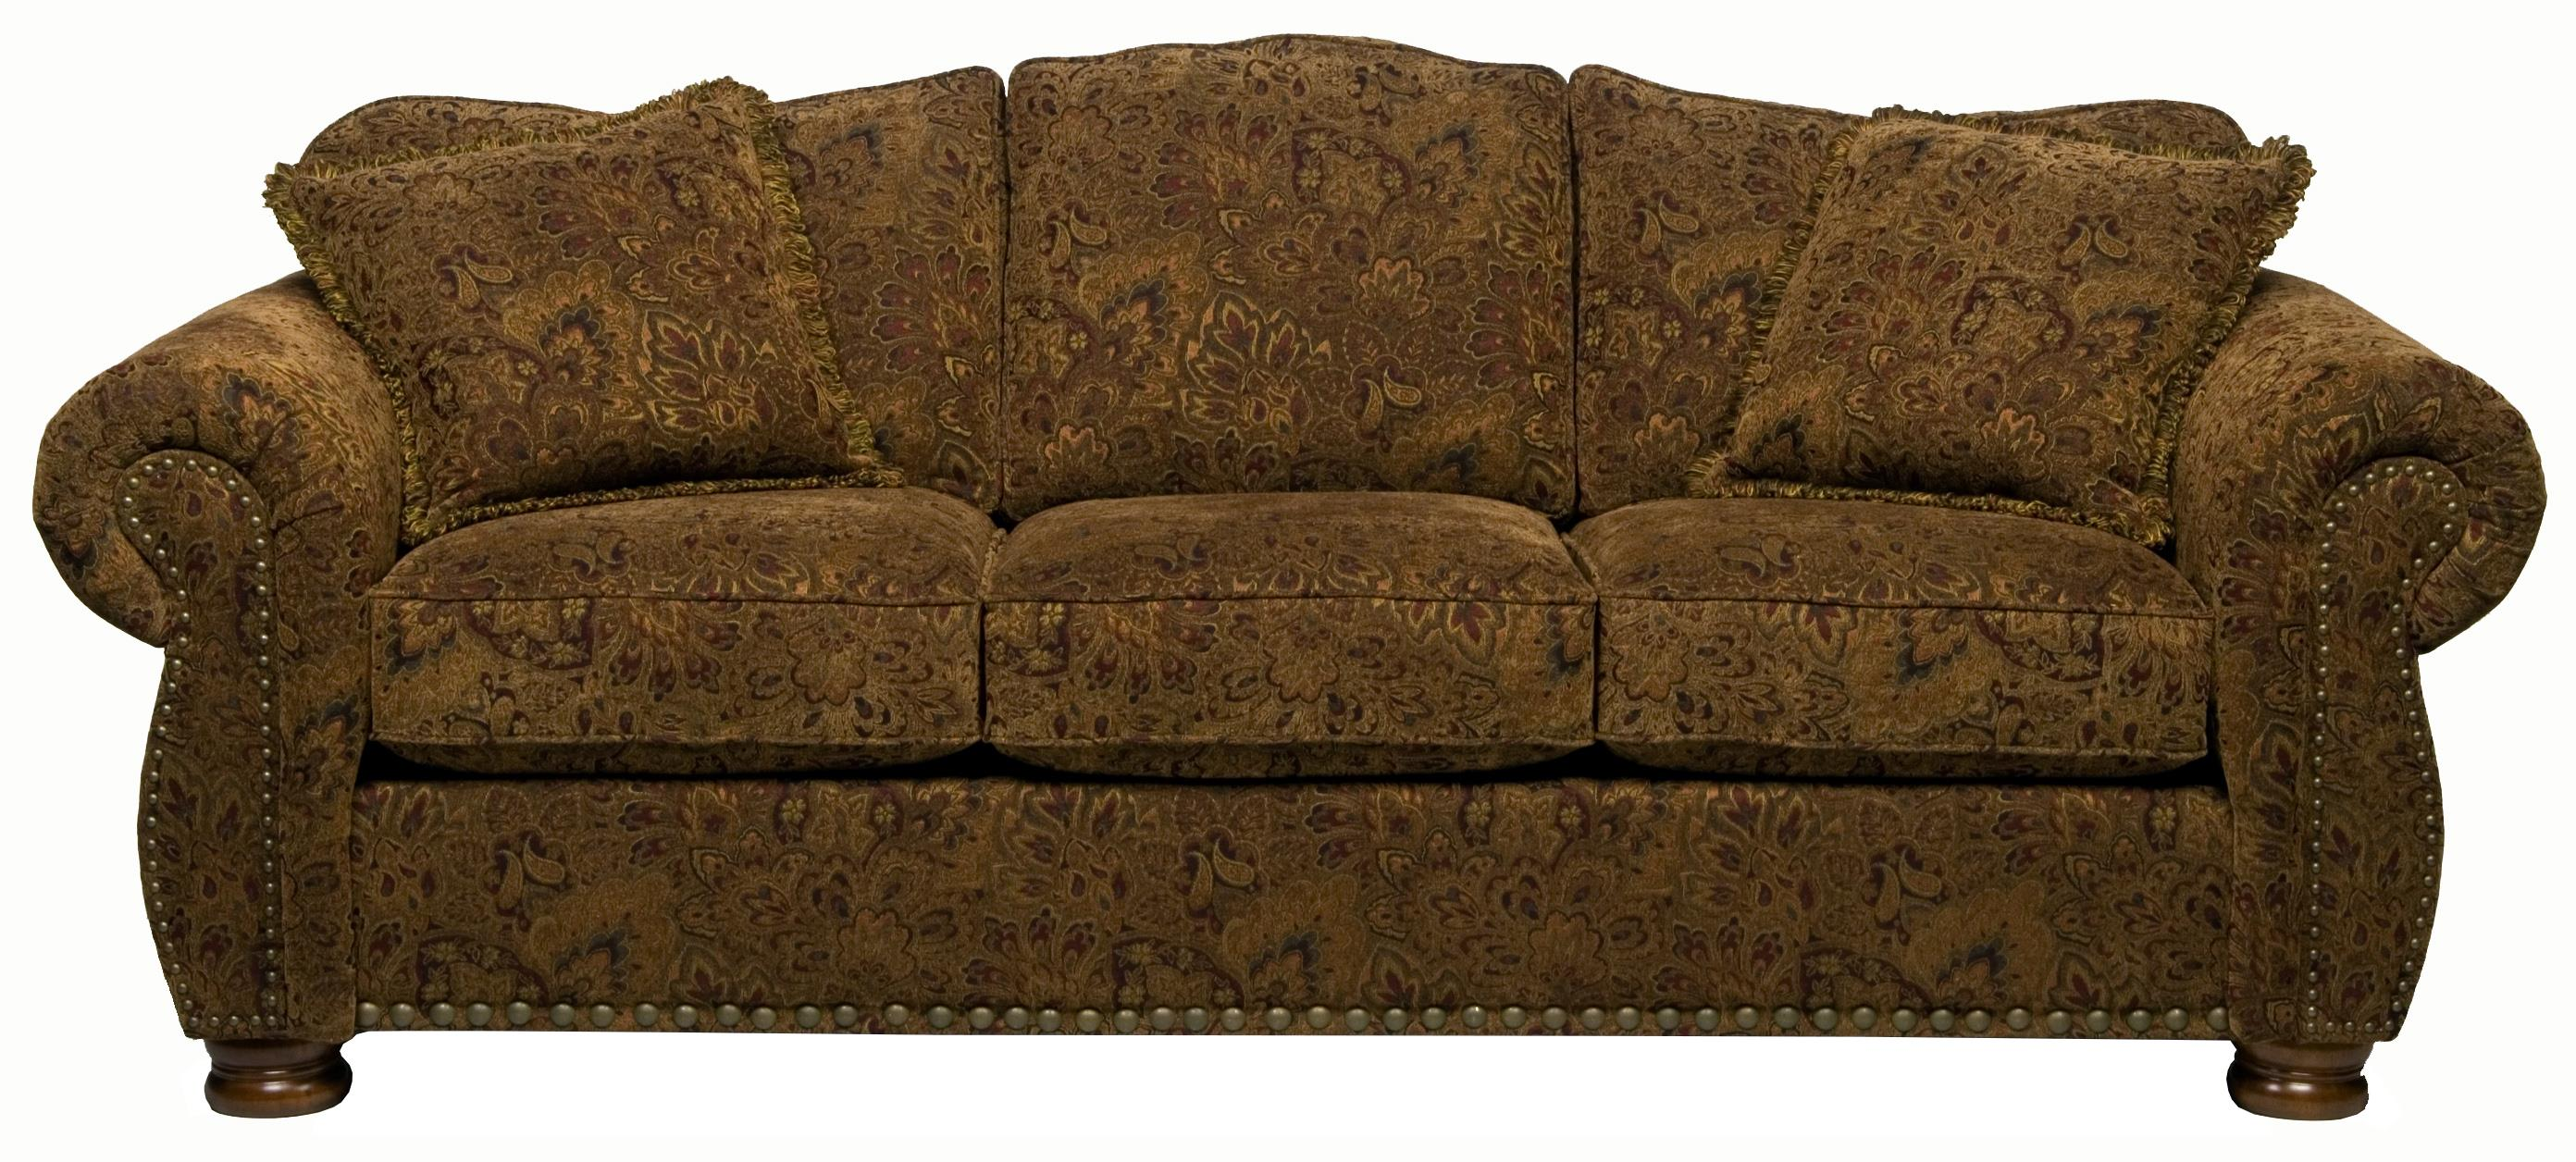 Stanton 326  Camel Back Queen Basic Sofa Sleeper - Item Number: 326-15B